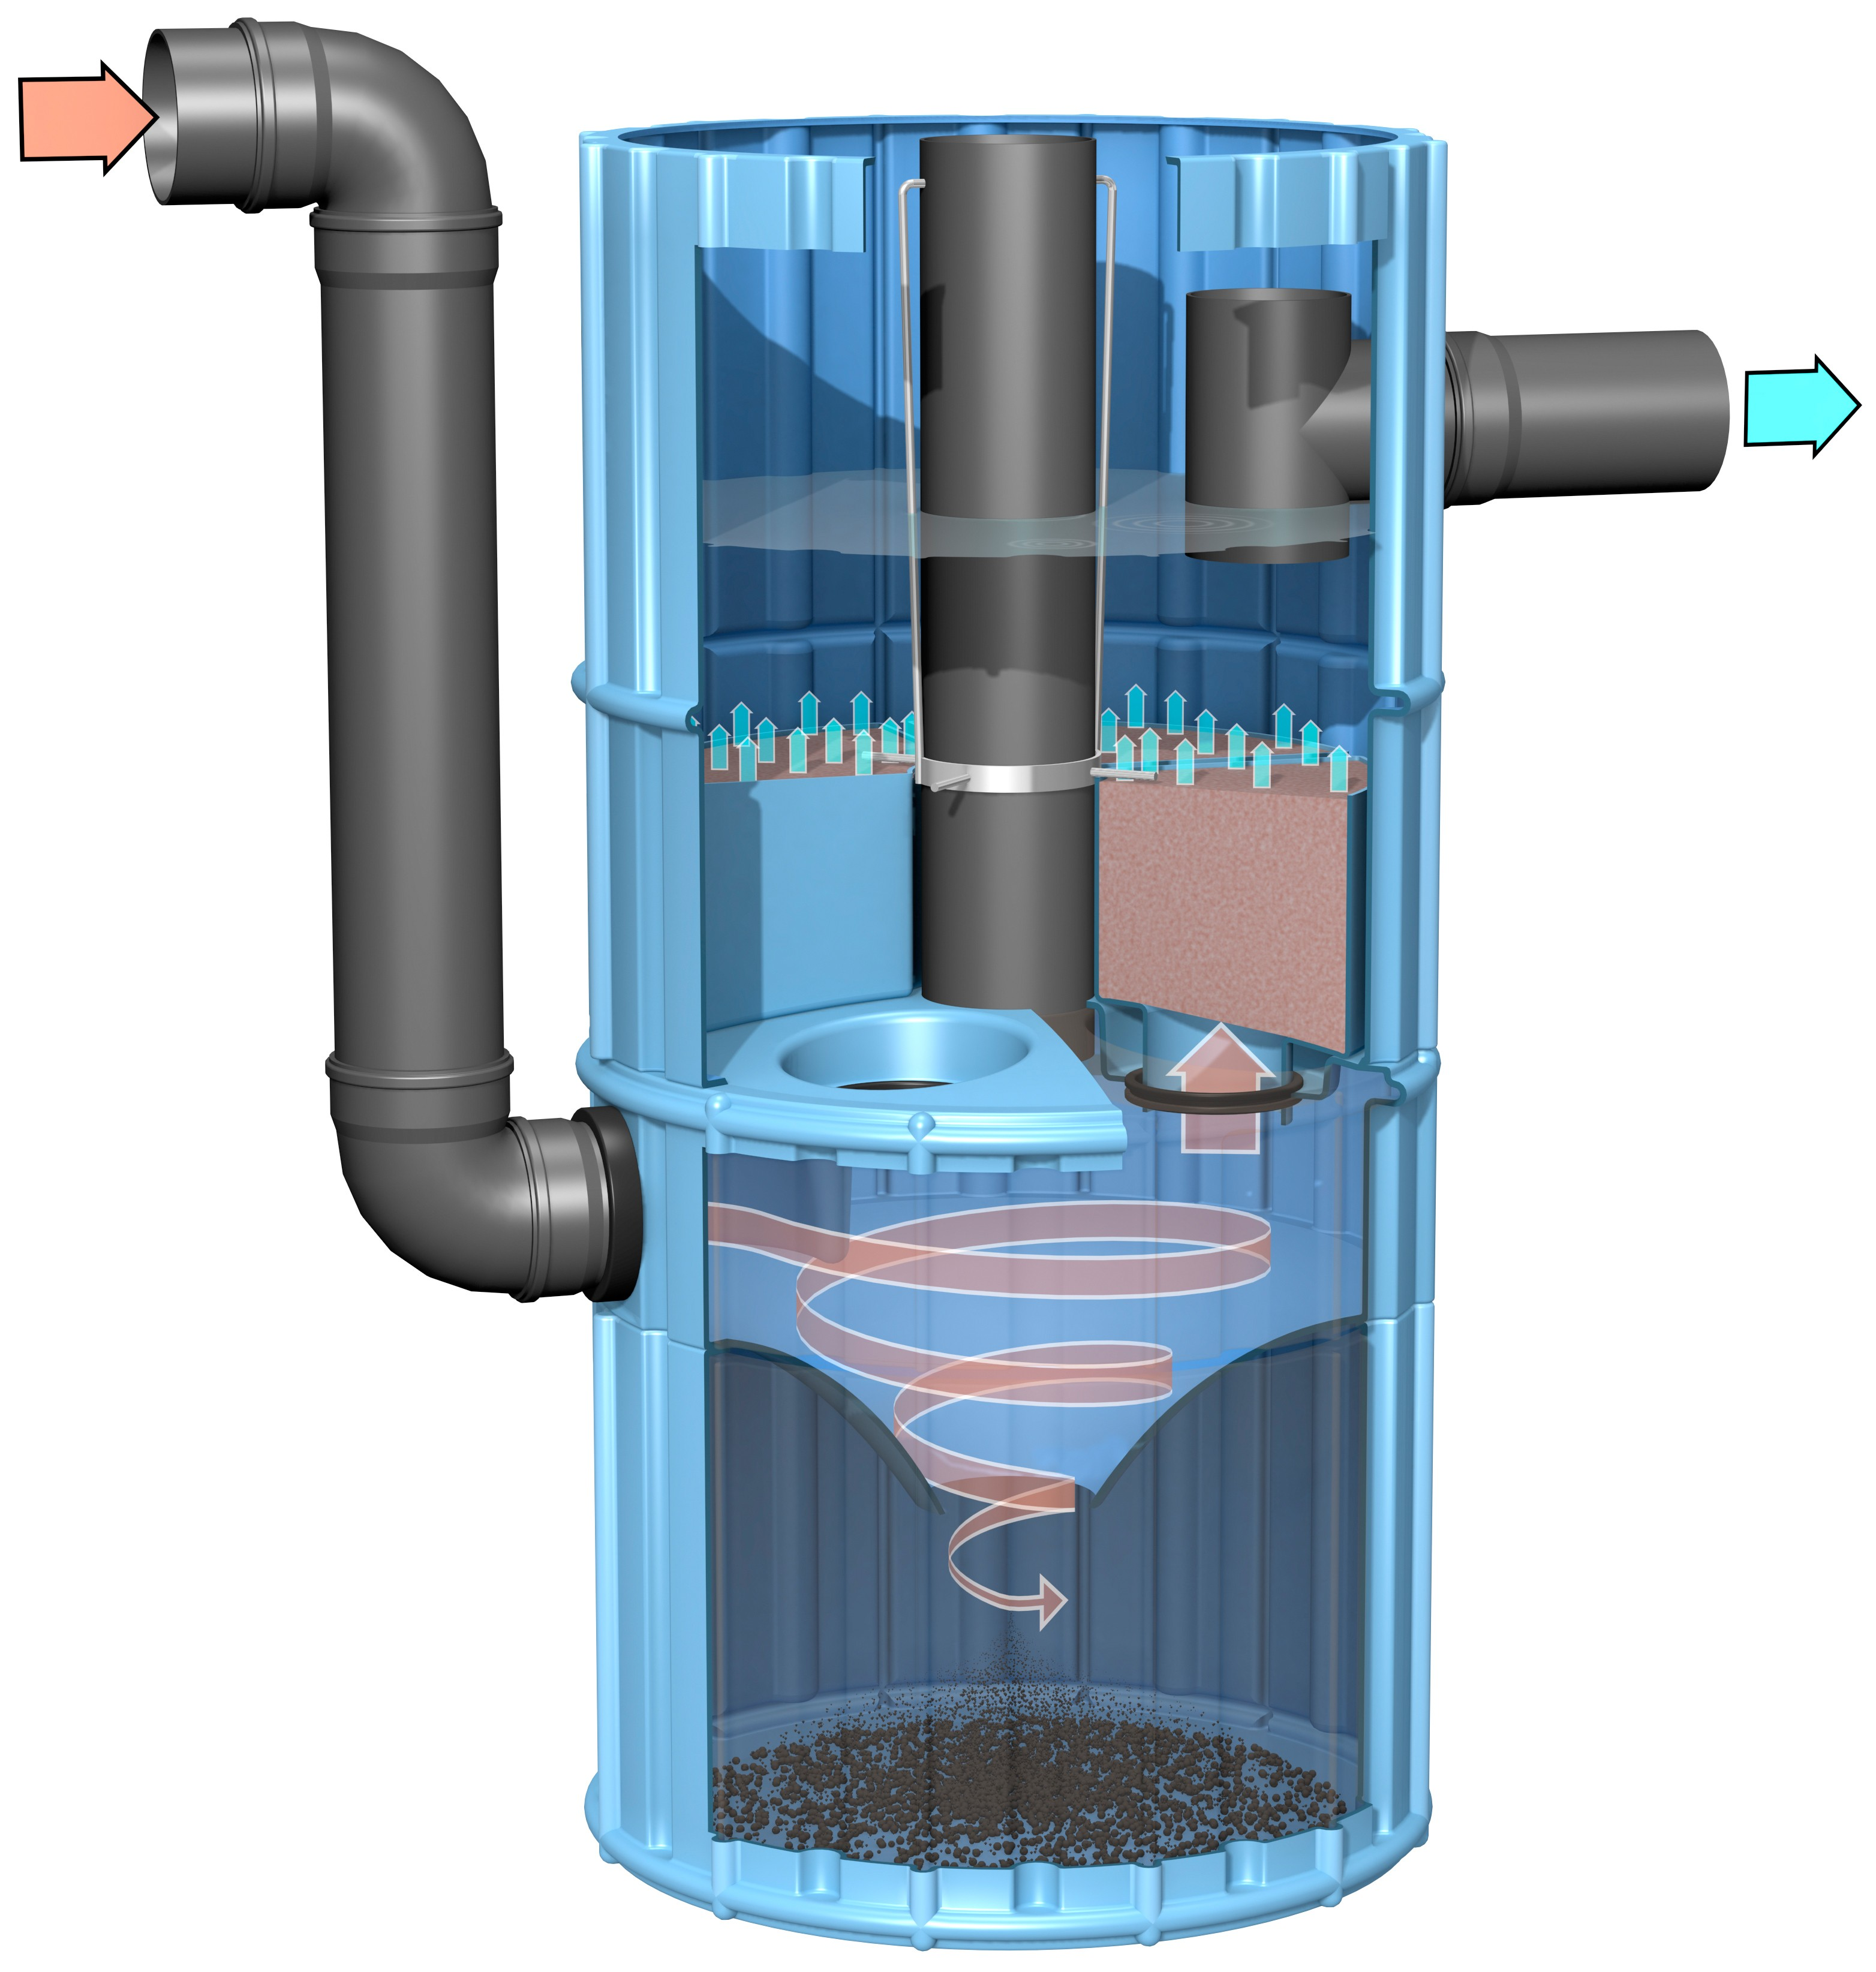 HydrodynamicSeparatorsPage_smallpic